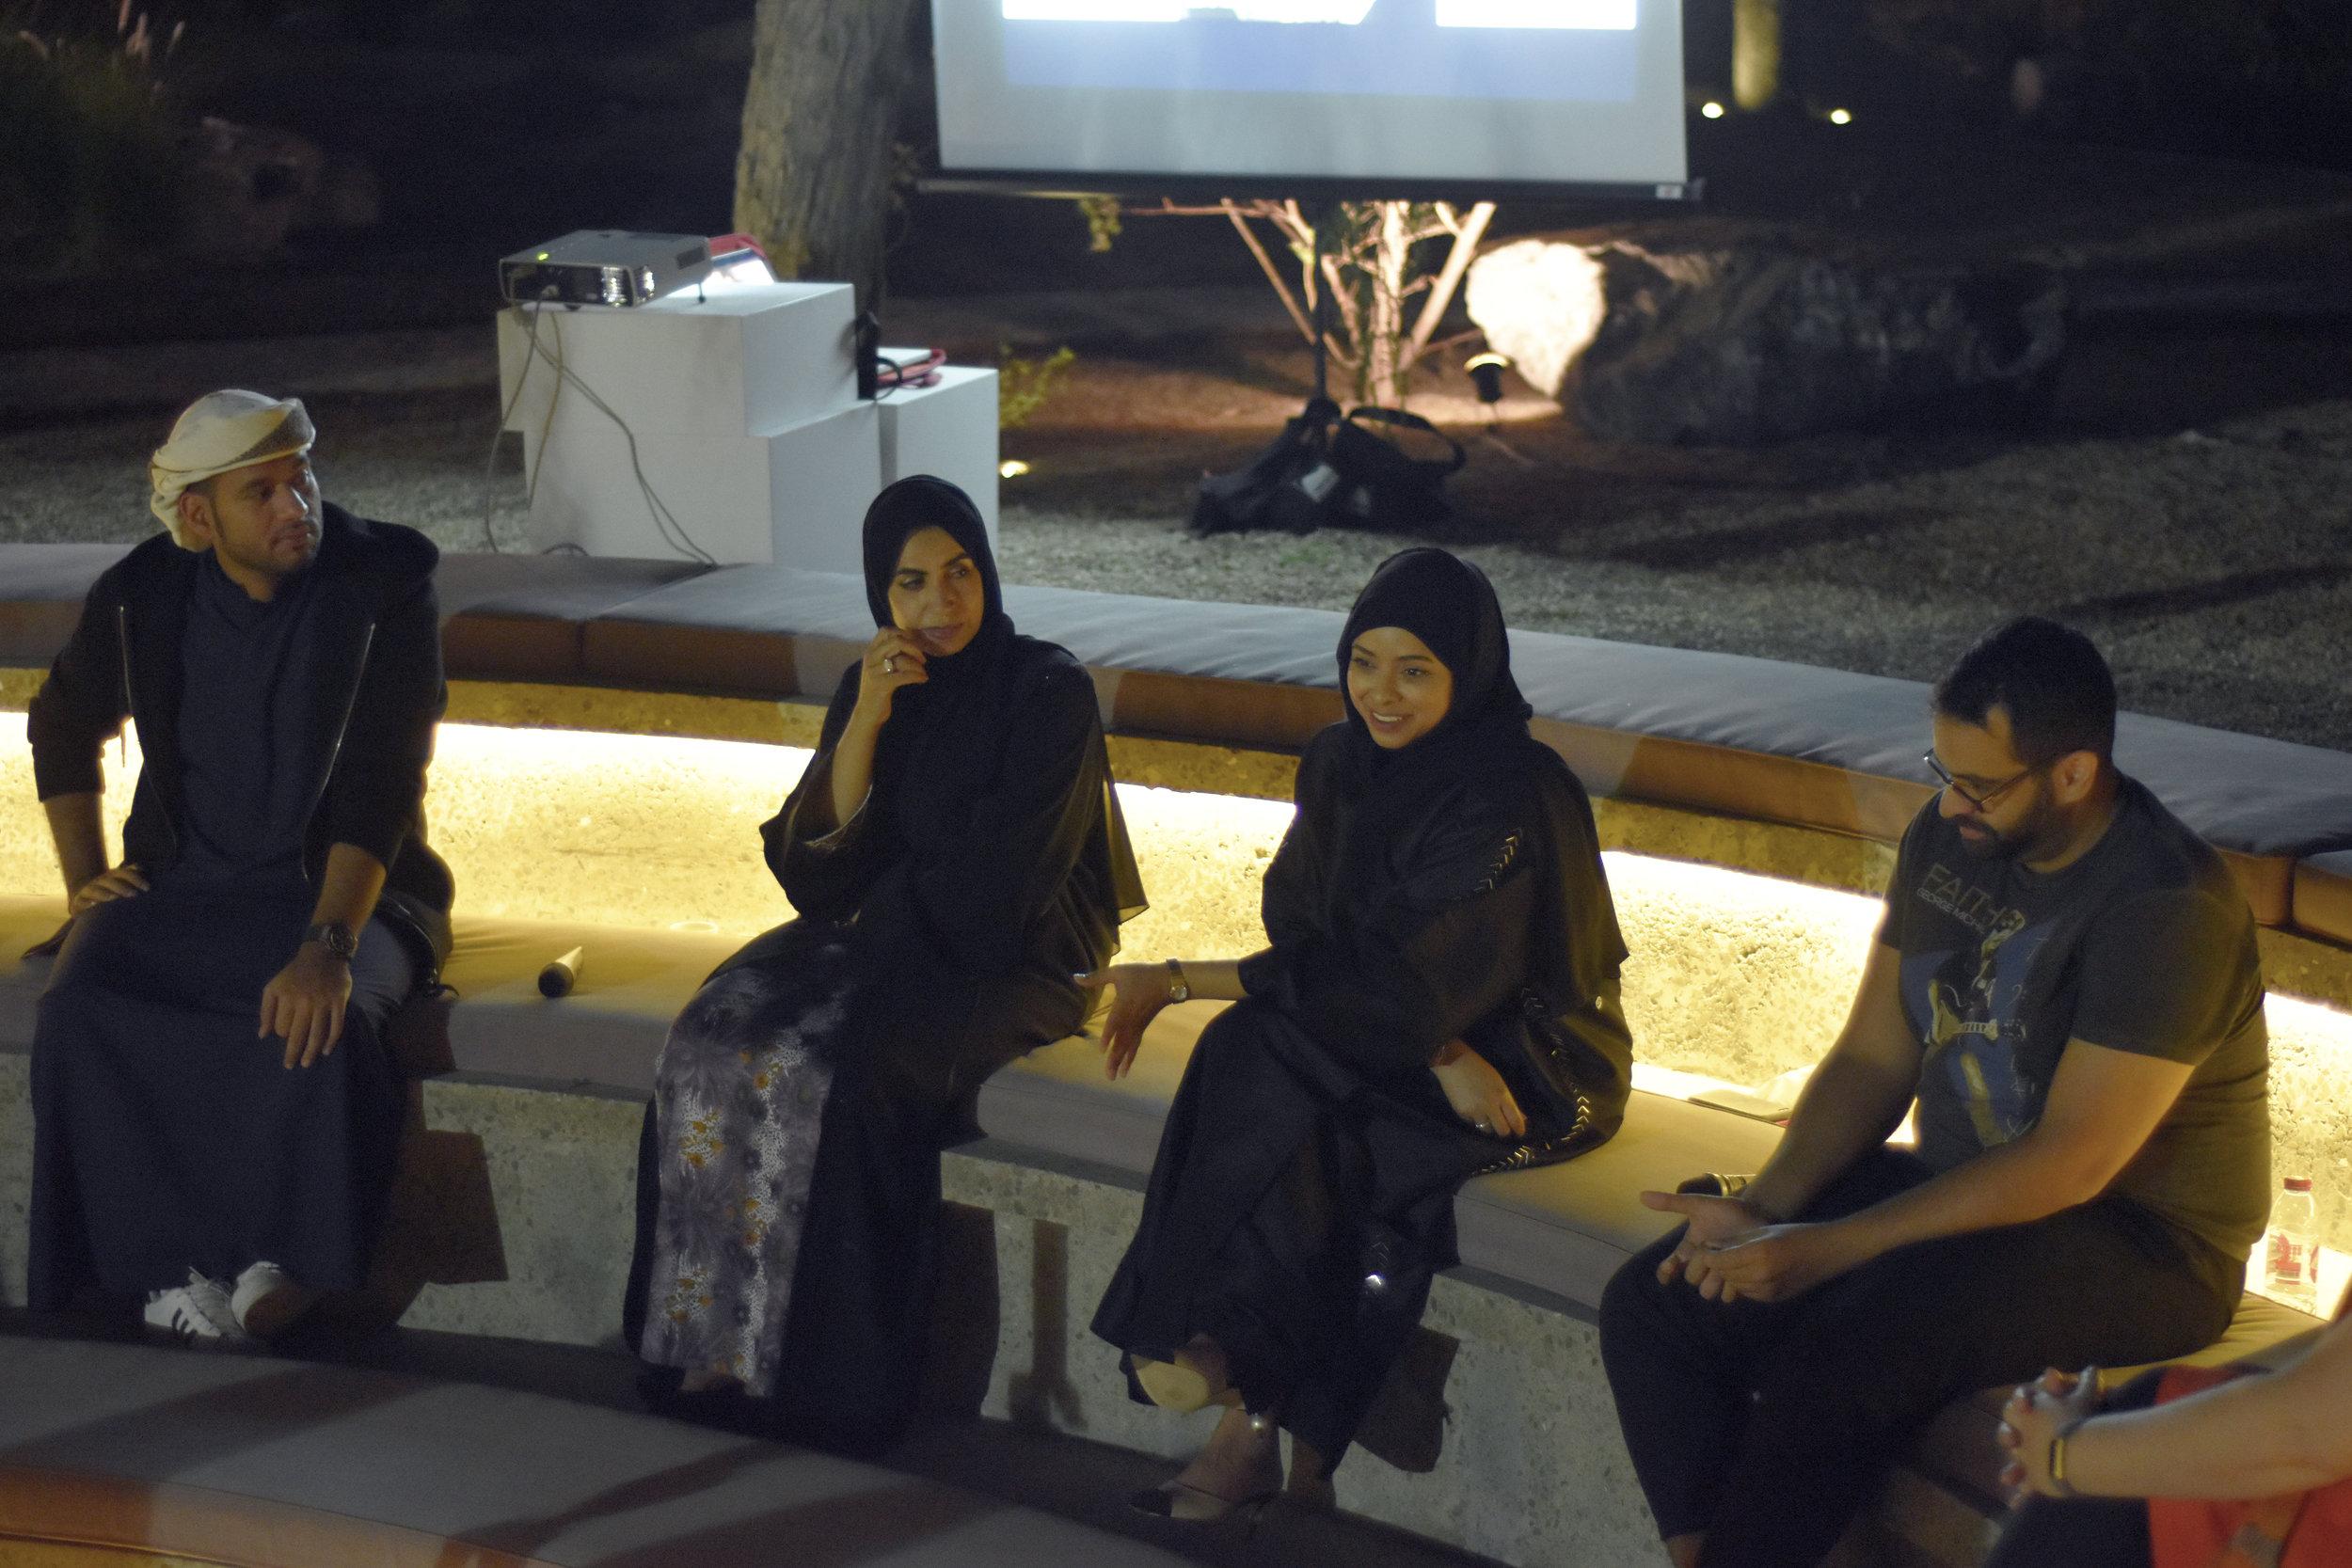 Tashkeel Talk with Saeed Al Madani, Dr. Karima Al Shomaly, Salama Nasib and Khalid Mezaina. Image courtesy of Tashkeel 5.jpg